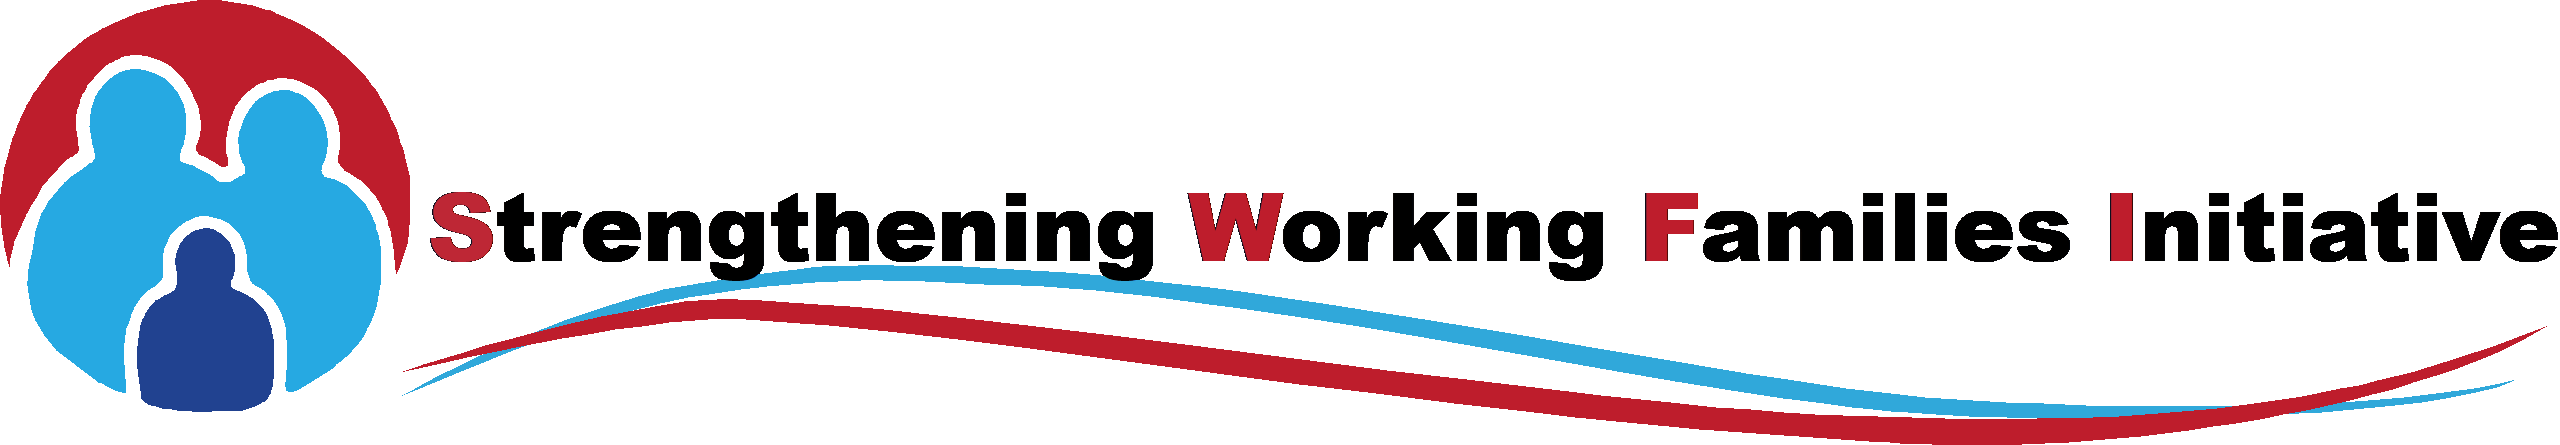 SWFI Logo